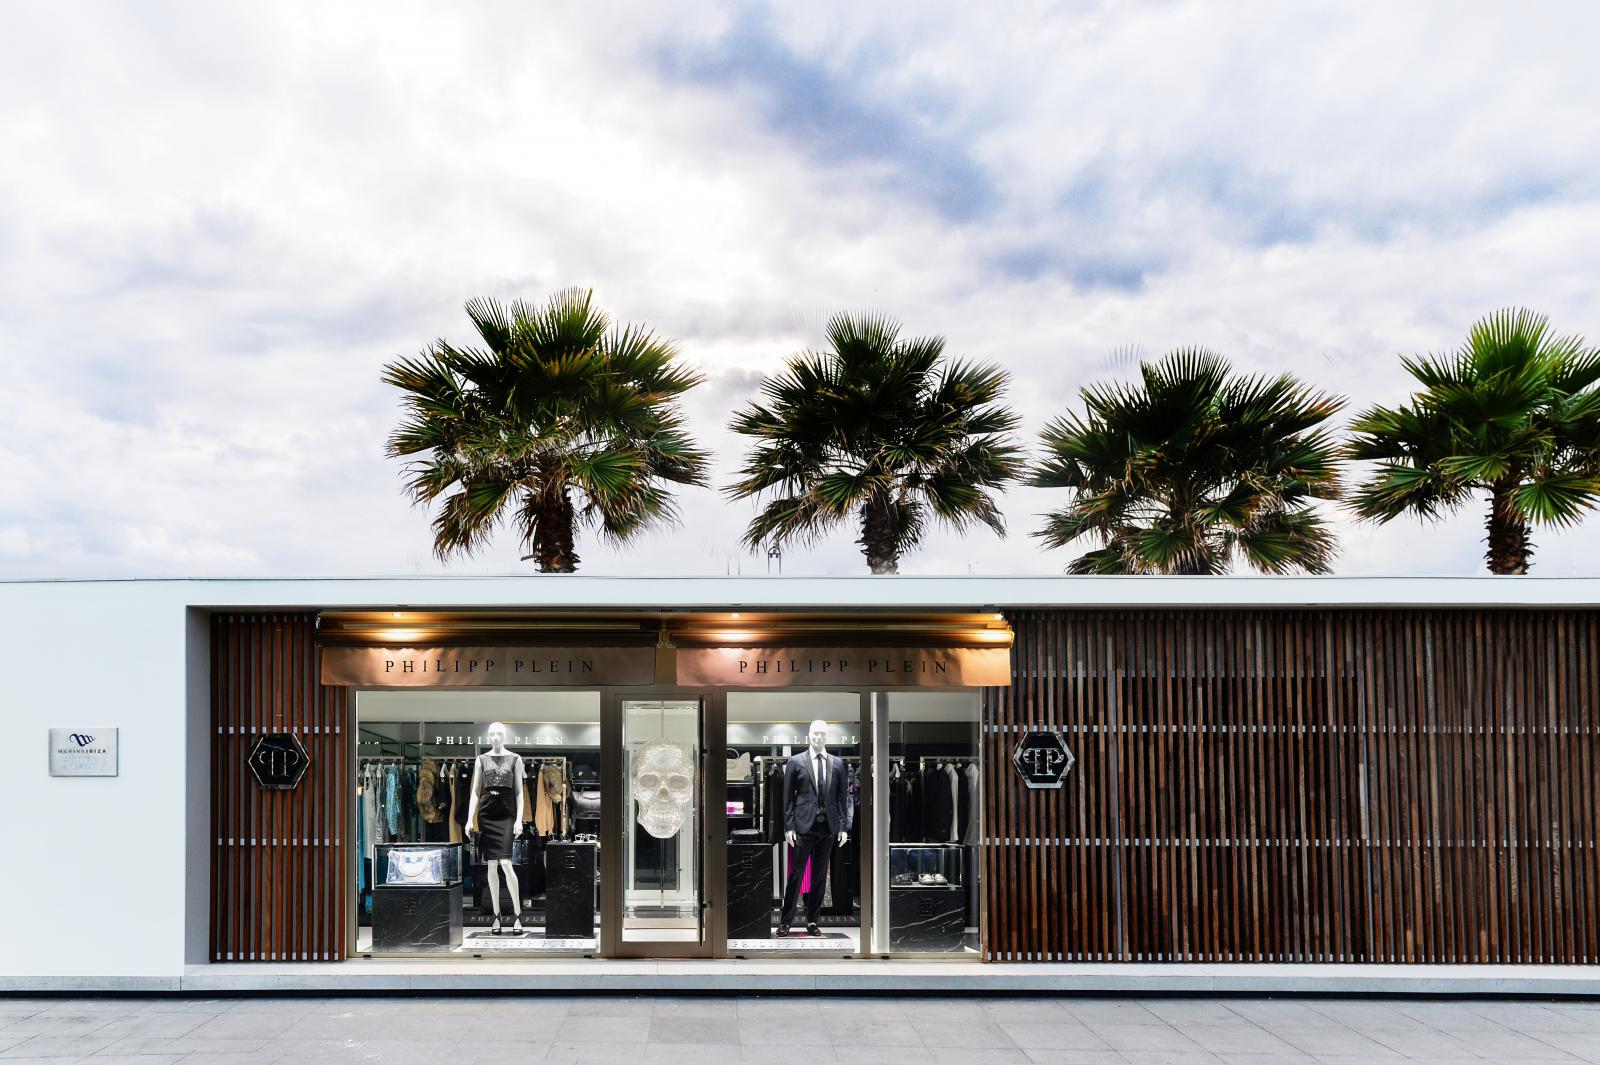 philipp-plein-temporary-store-ibiza-9-20140613212212